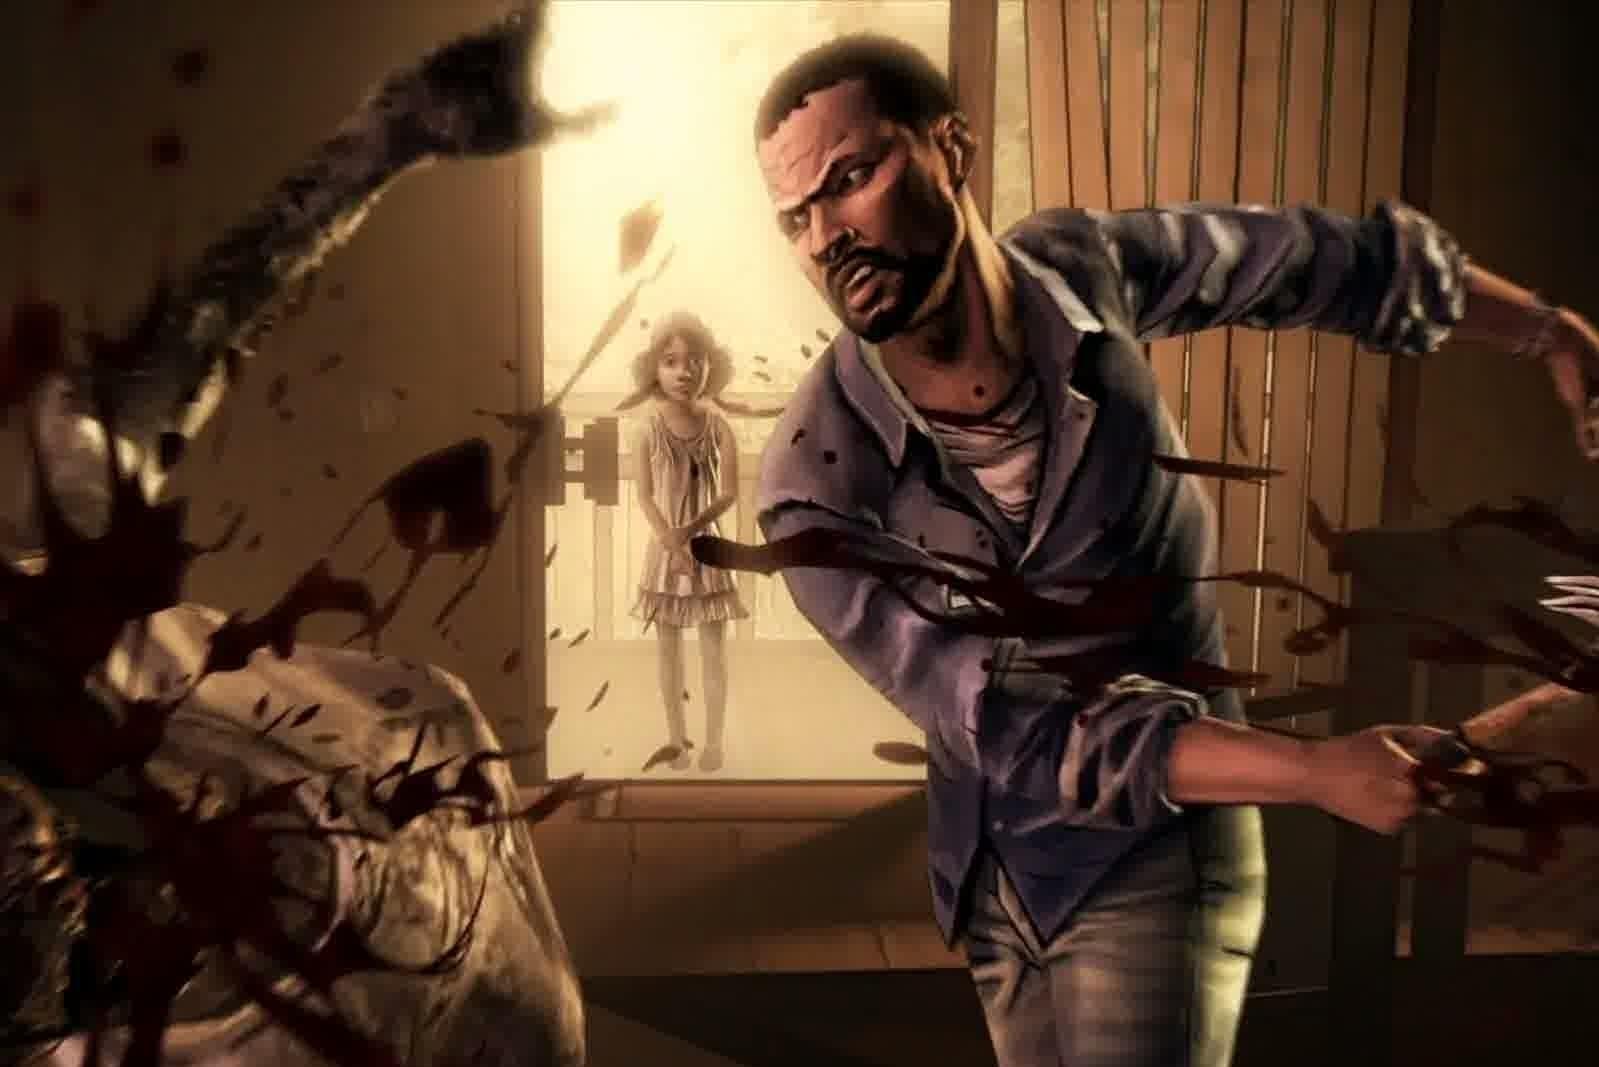 The Walking Dead desktop wallpaper 30 of 76 Video Game Wallpapers 1599x1067